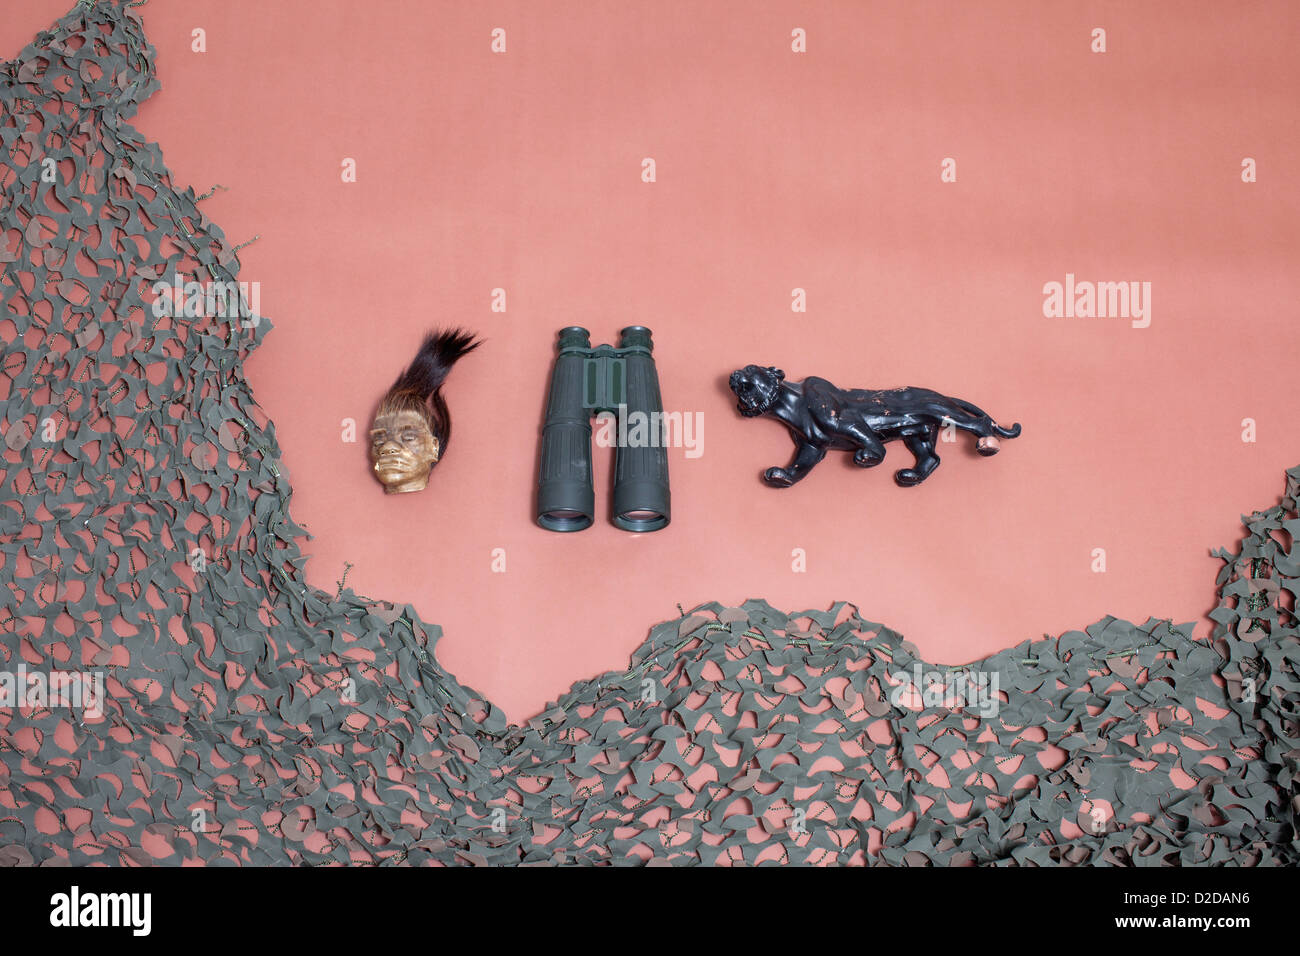 A shrunken head, binoculars, a jaguar and camouflage netting - Stock Image